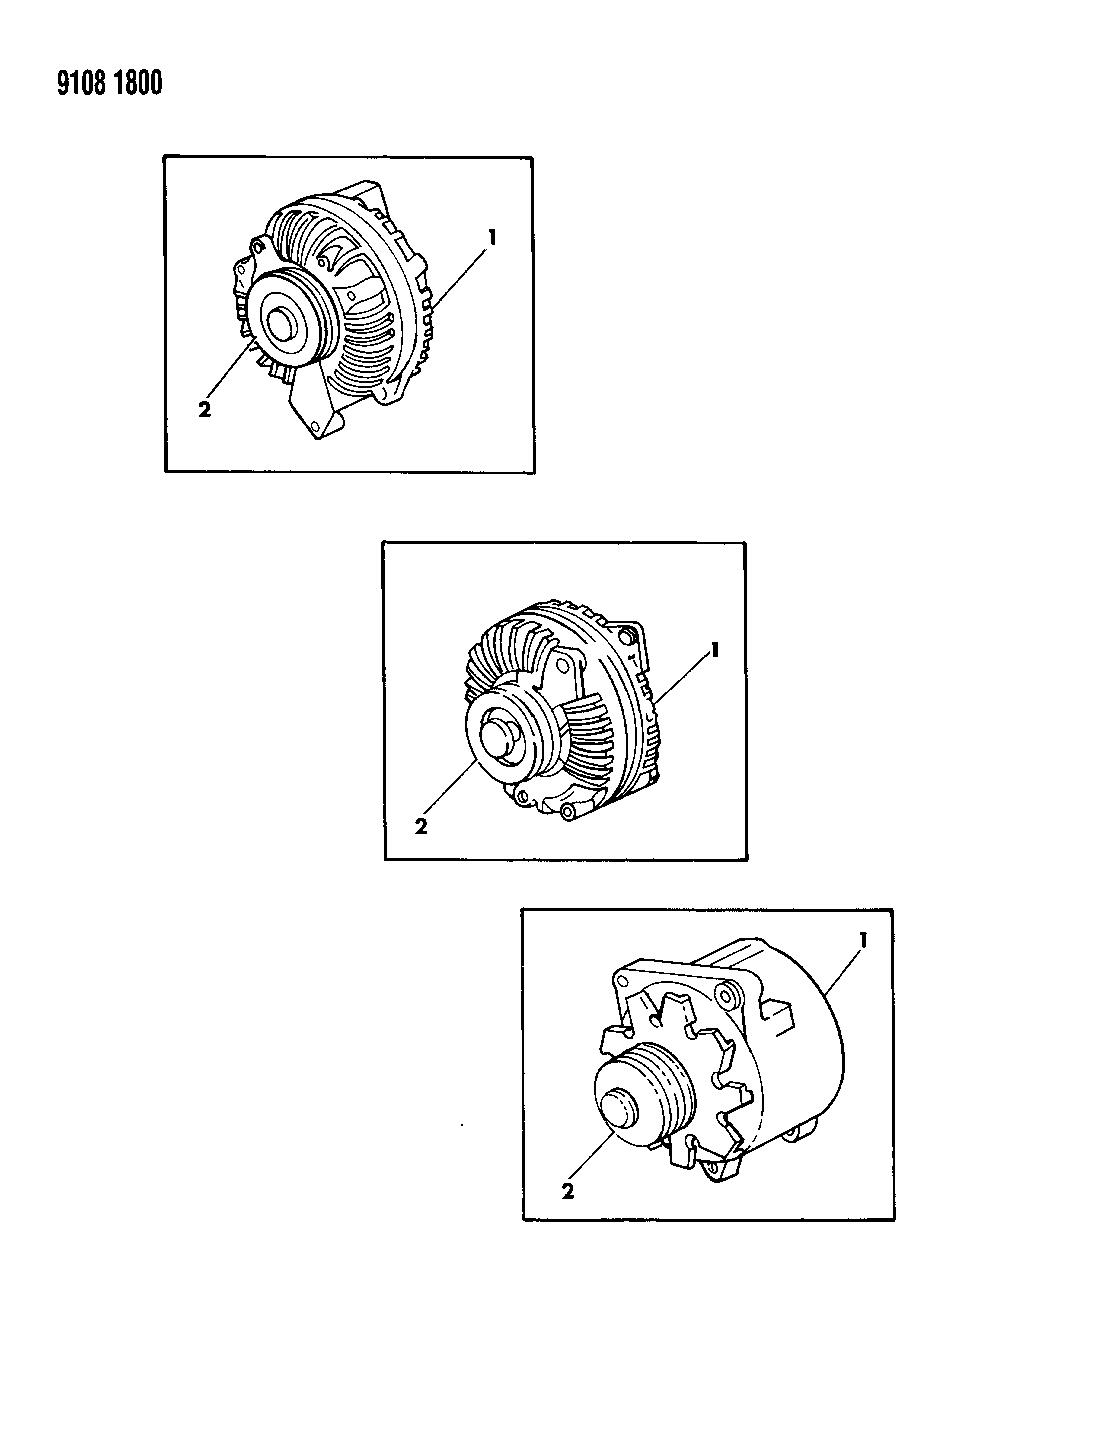 1988 dodge omni wiring diagrams